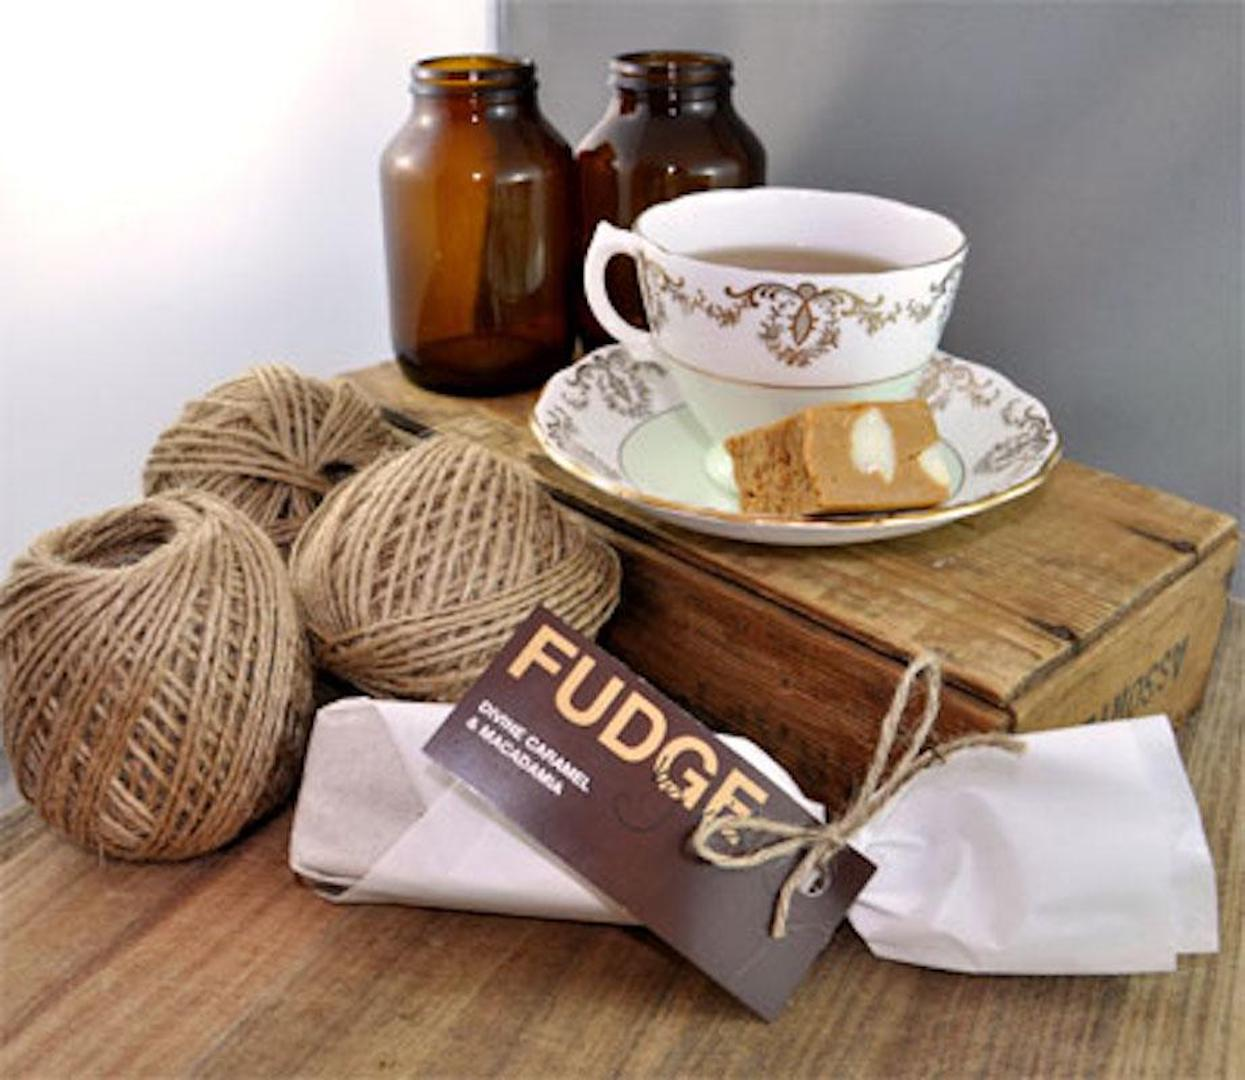 Handmade Fudge by Rich Yarra Valley